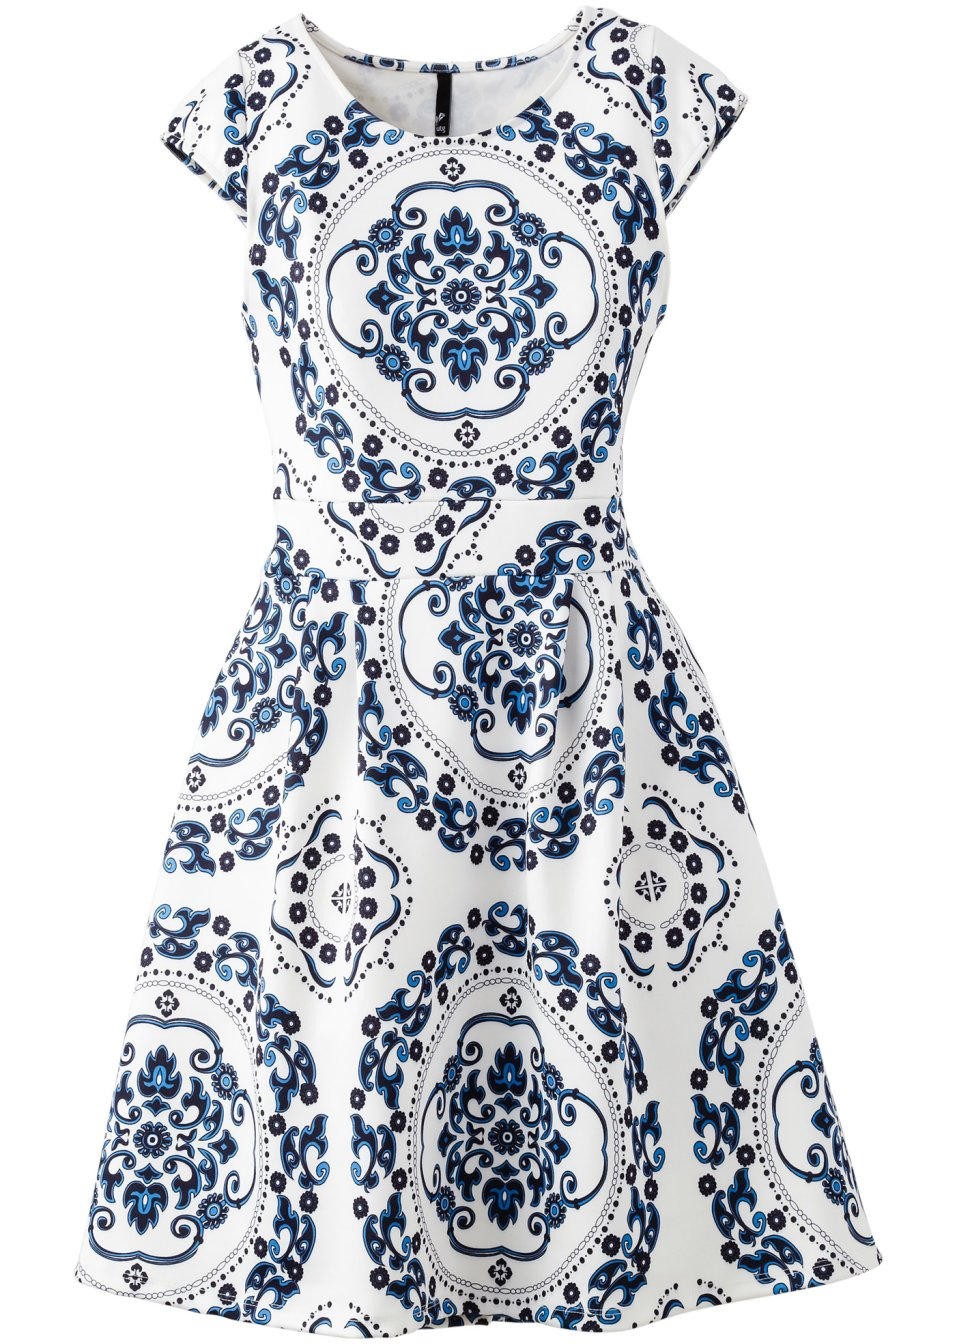 vestido em look scuba azul branco moda feminina. Black Bedroom Furniture Sets. Home Design Ideas